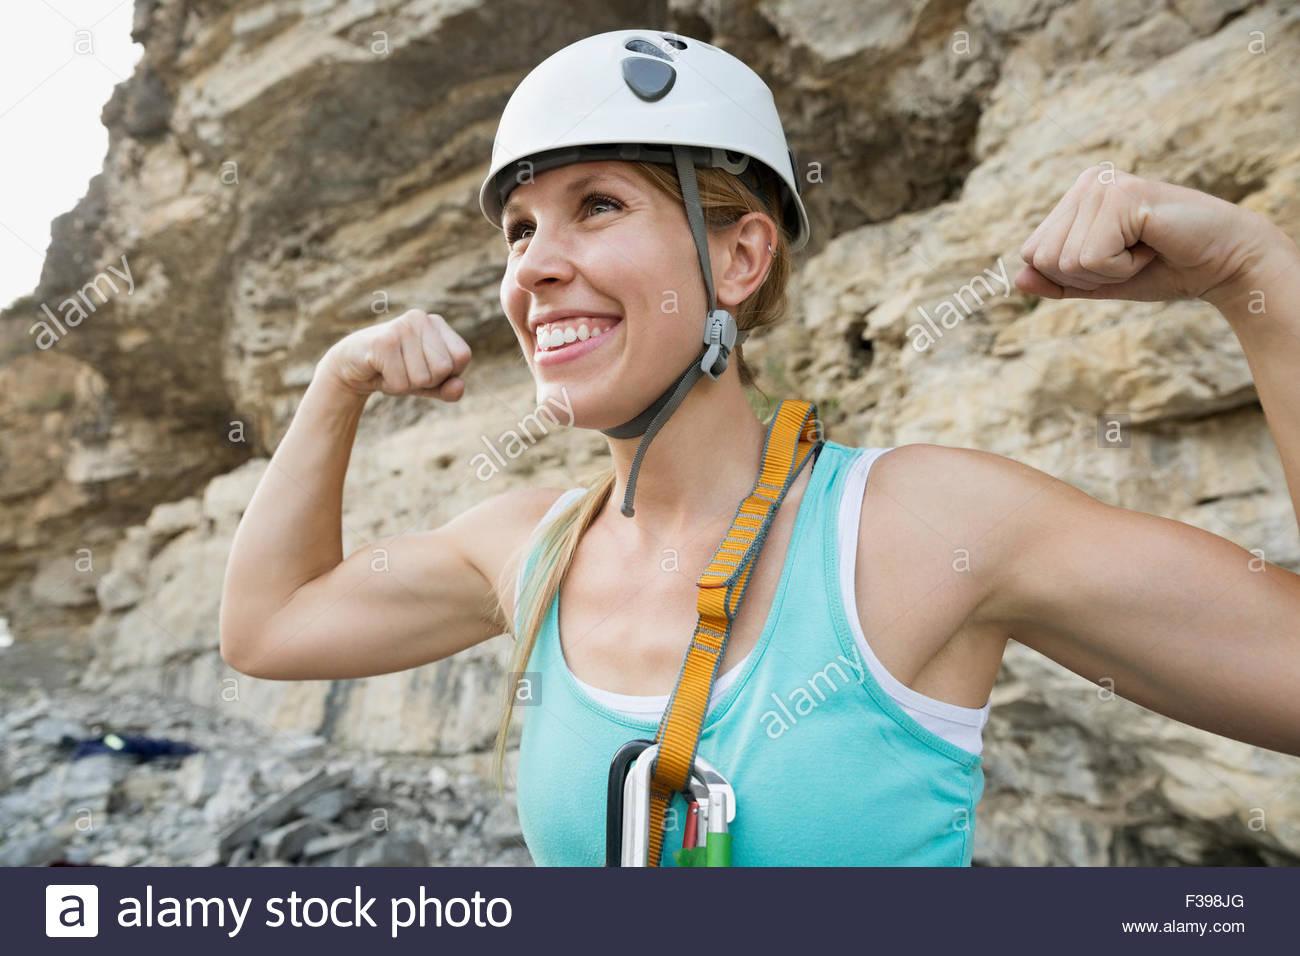 Portrait confident female rock climber flexing biceps - Stock Image